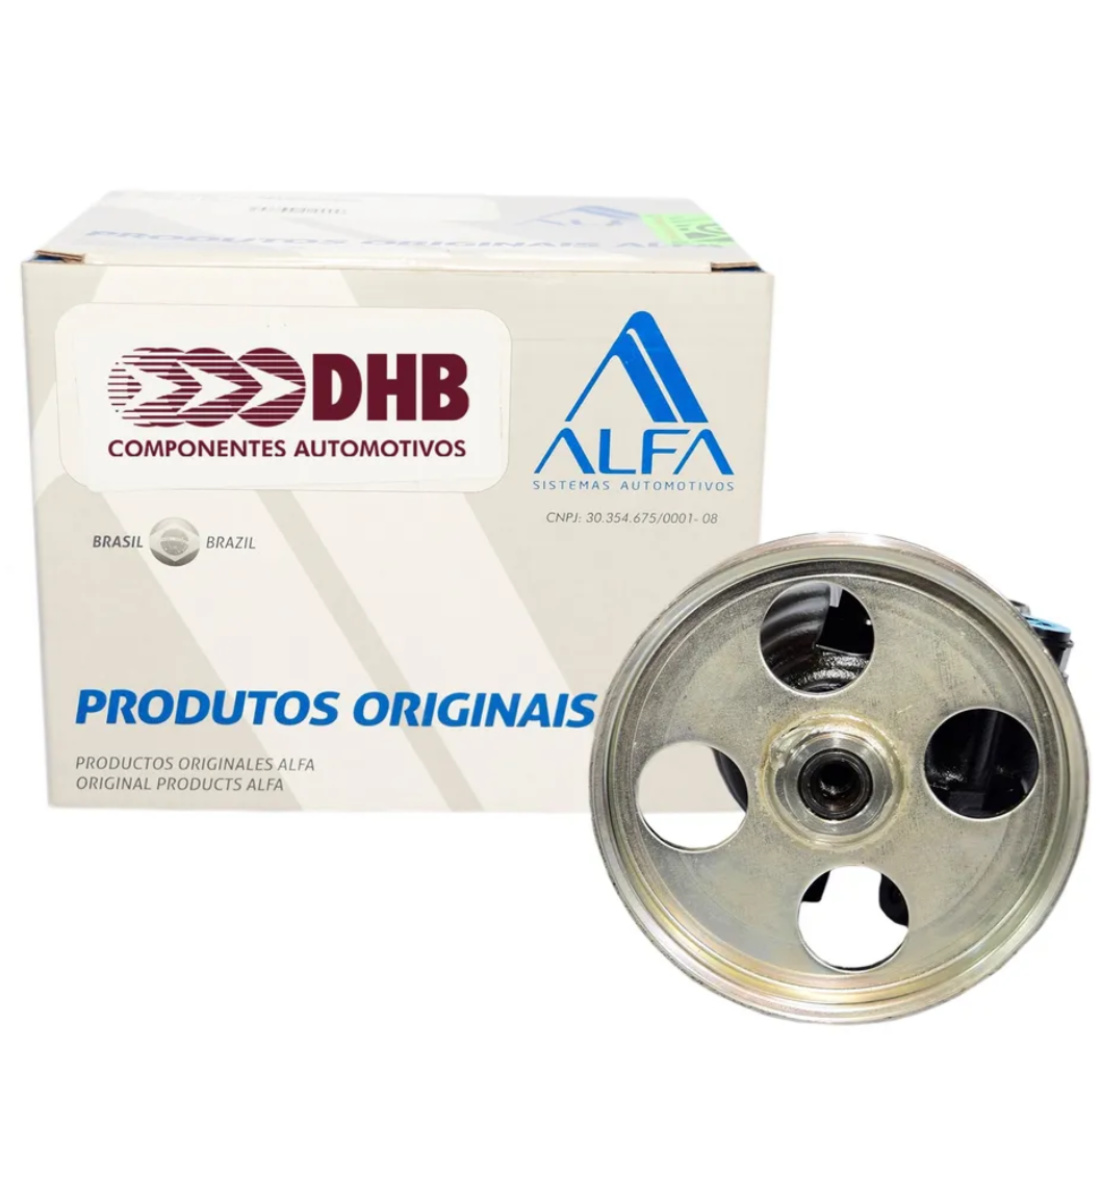 Bomba Direção Hidráulica DHB Blazer S10 MPFI 2.2, 2.4 97...03